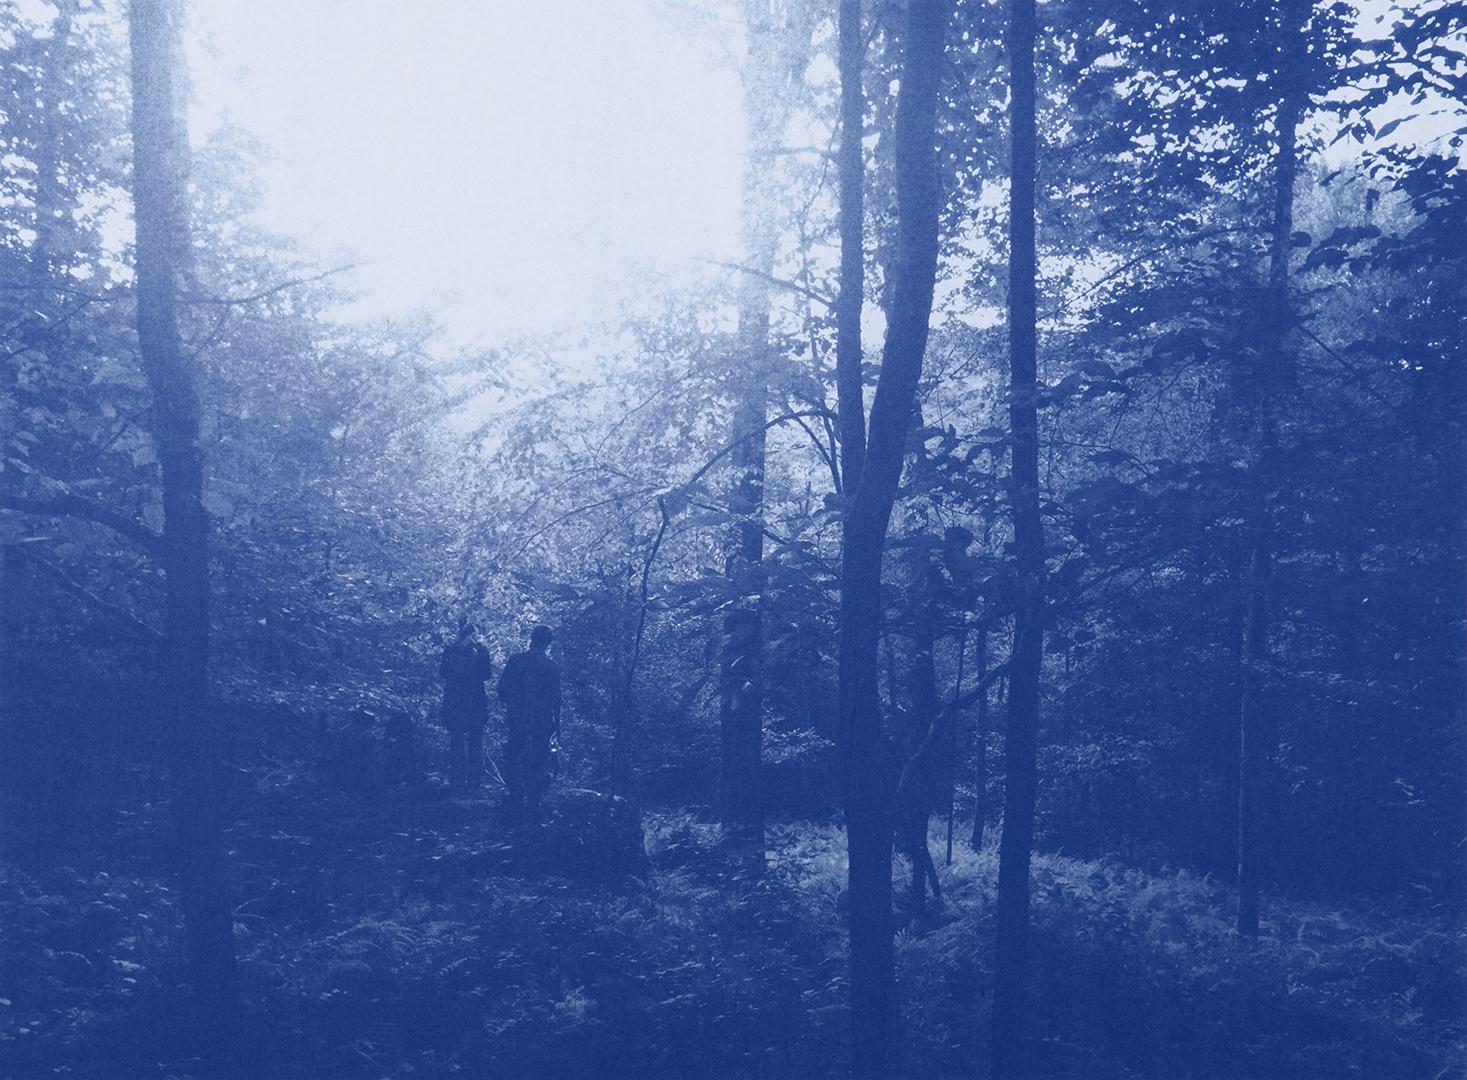 18_TIM_BARBER_BLUES.jpg